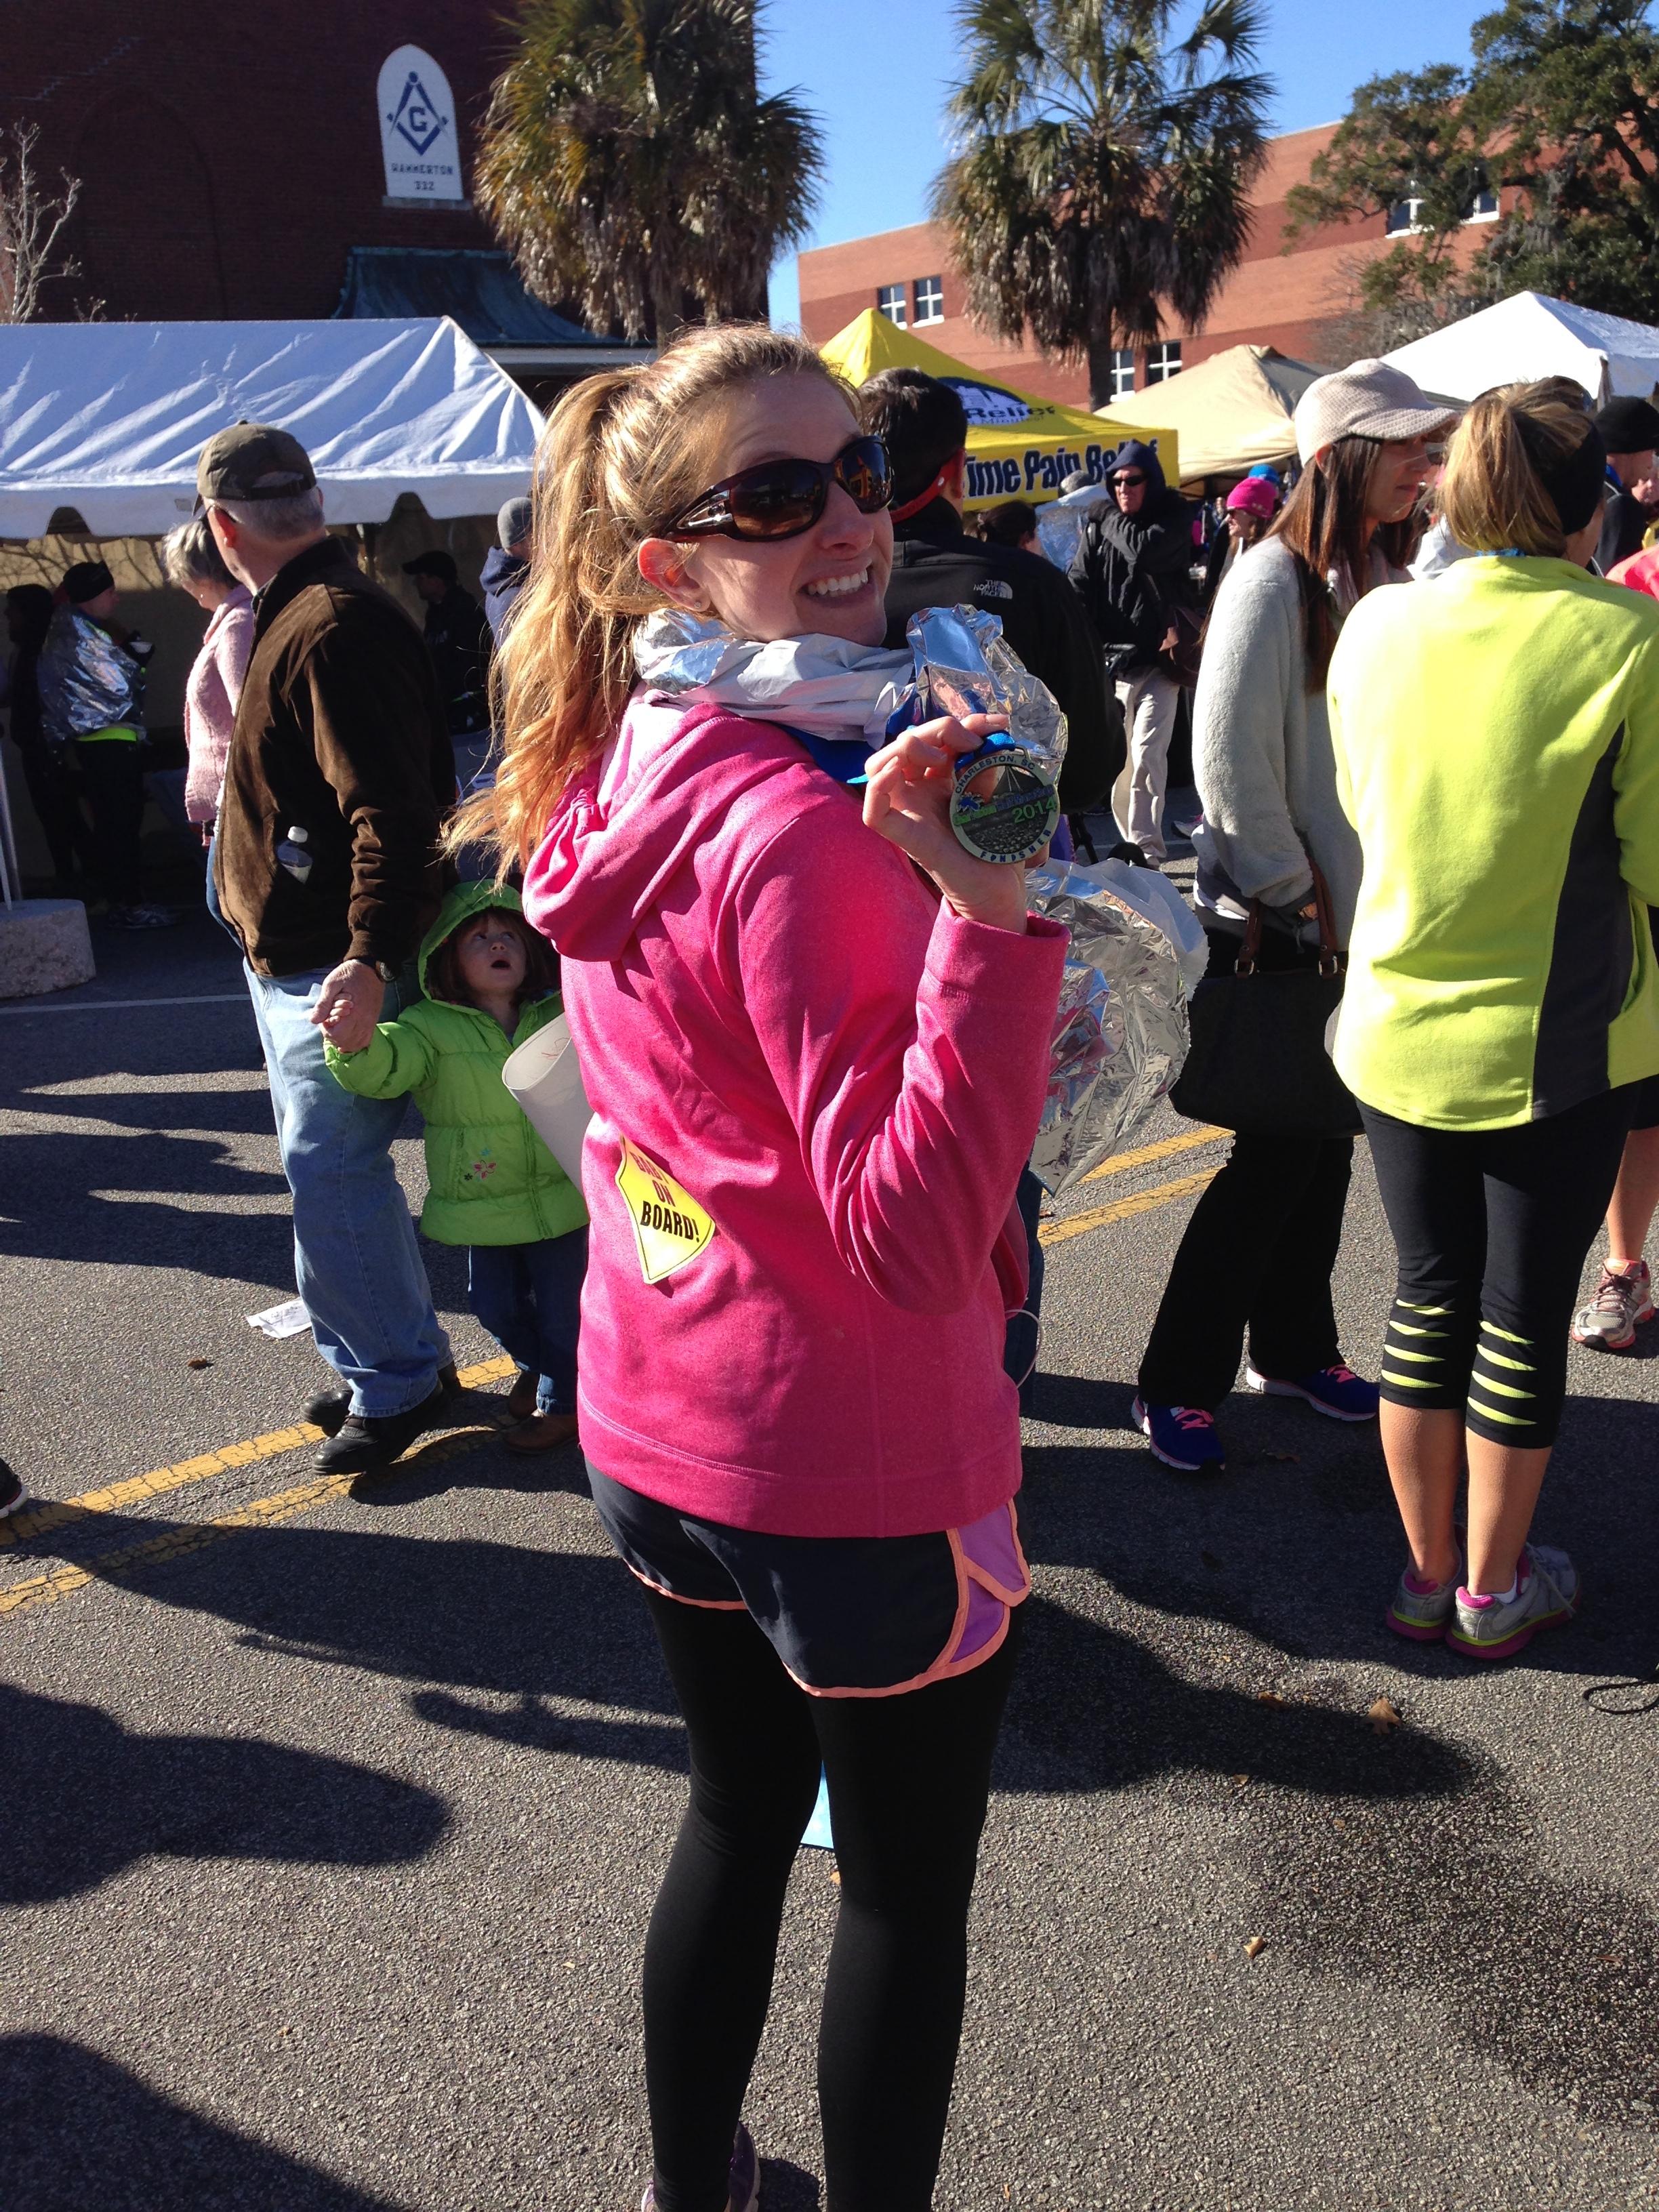 After finishing a half marathon at 20 weeks pregnant